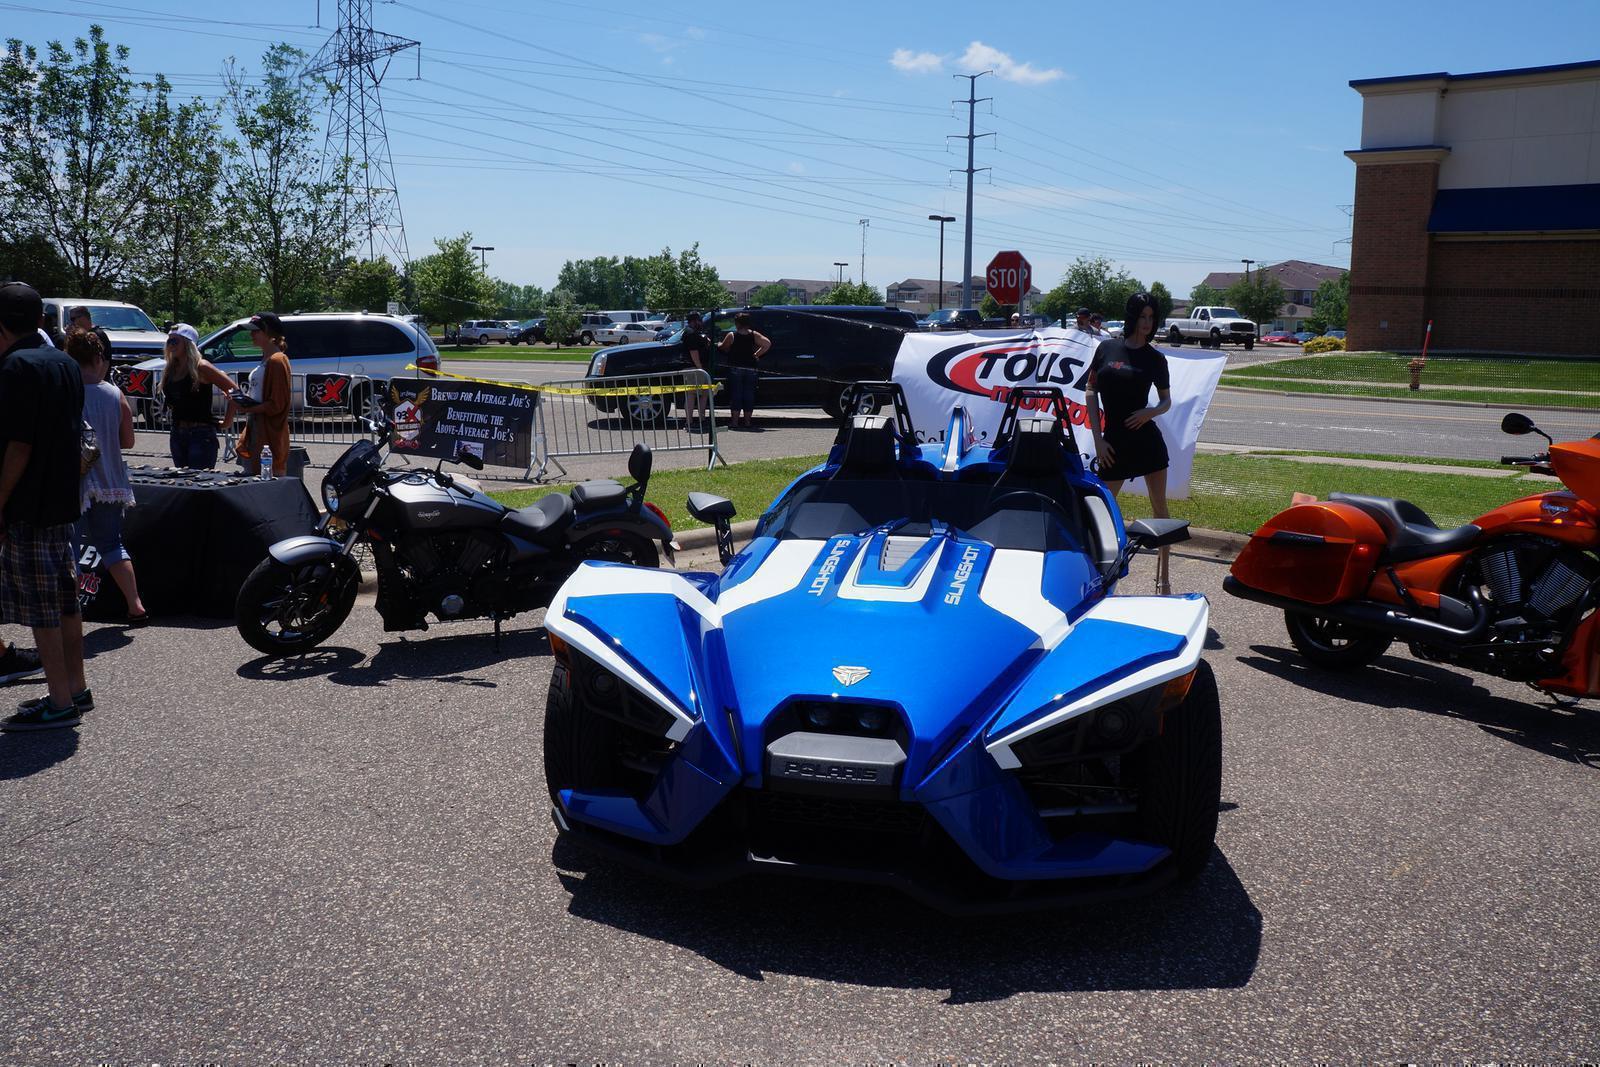 Average Joe Car And Bike Show Tousley Motorsports White Bear - Car and bike show